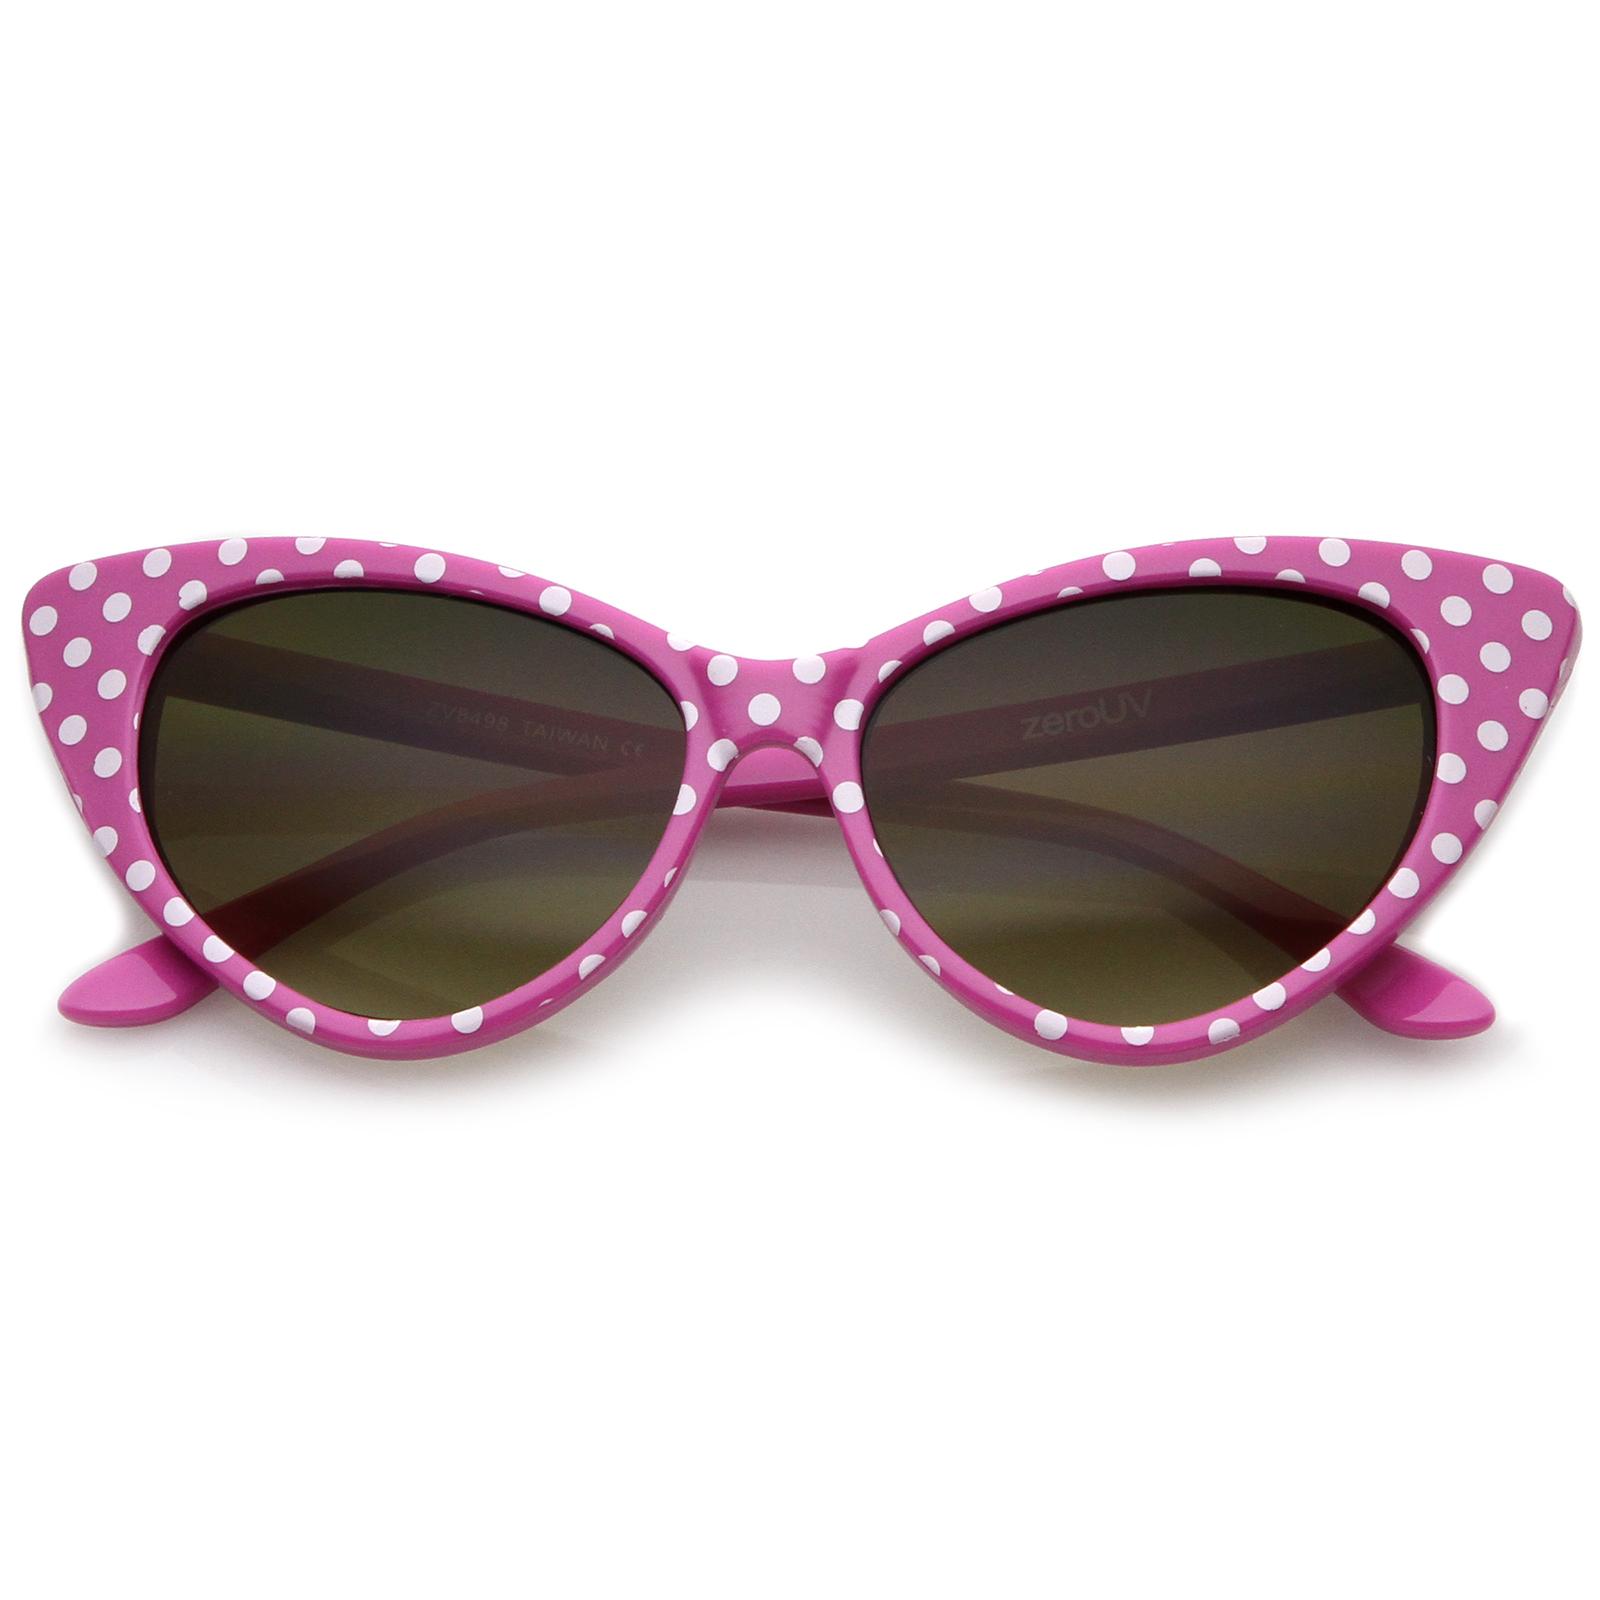 SunglassLA Women's Retro Polka Dot Oversize Cat Eye